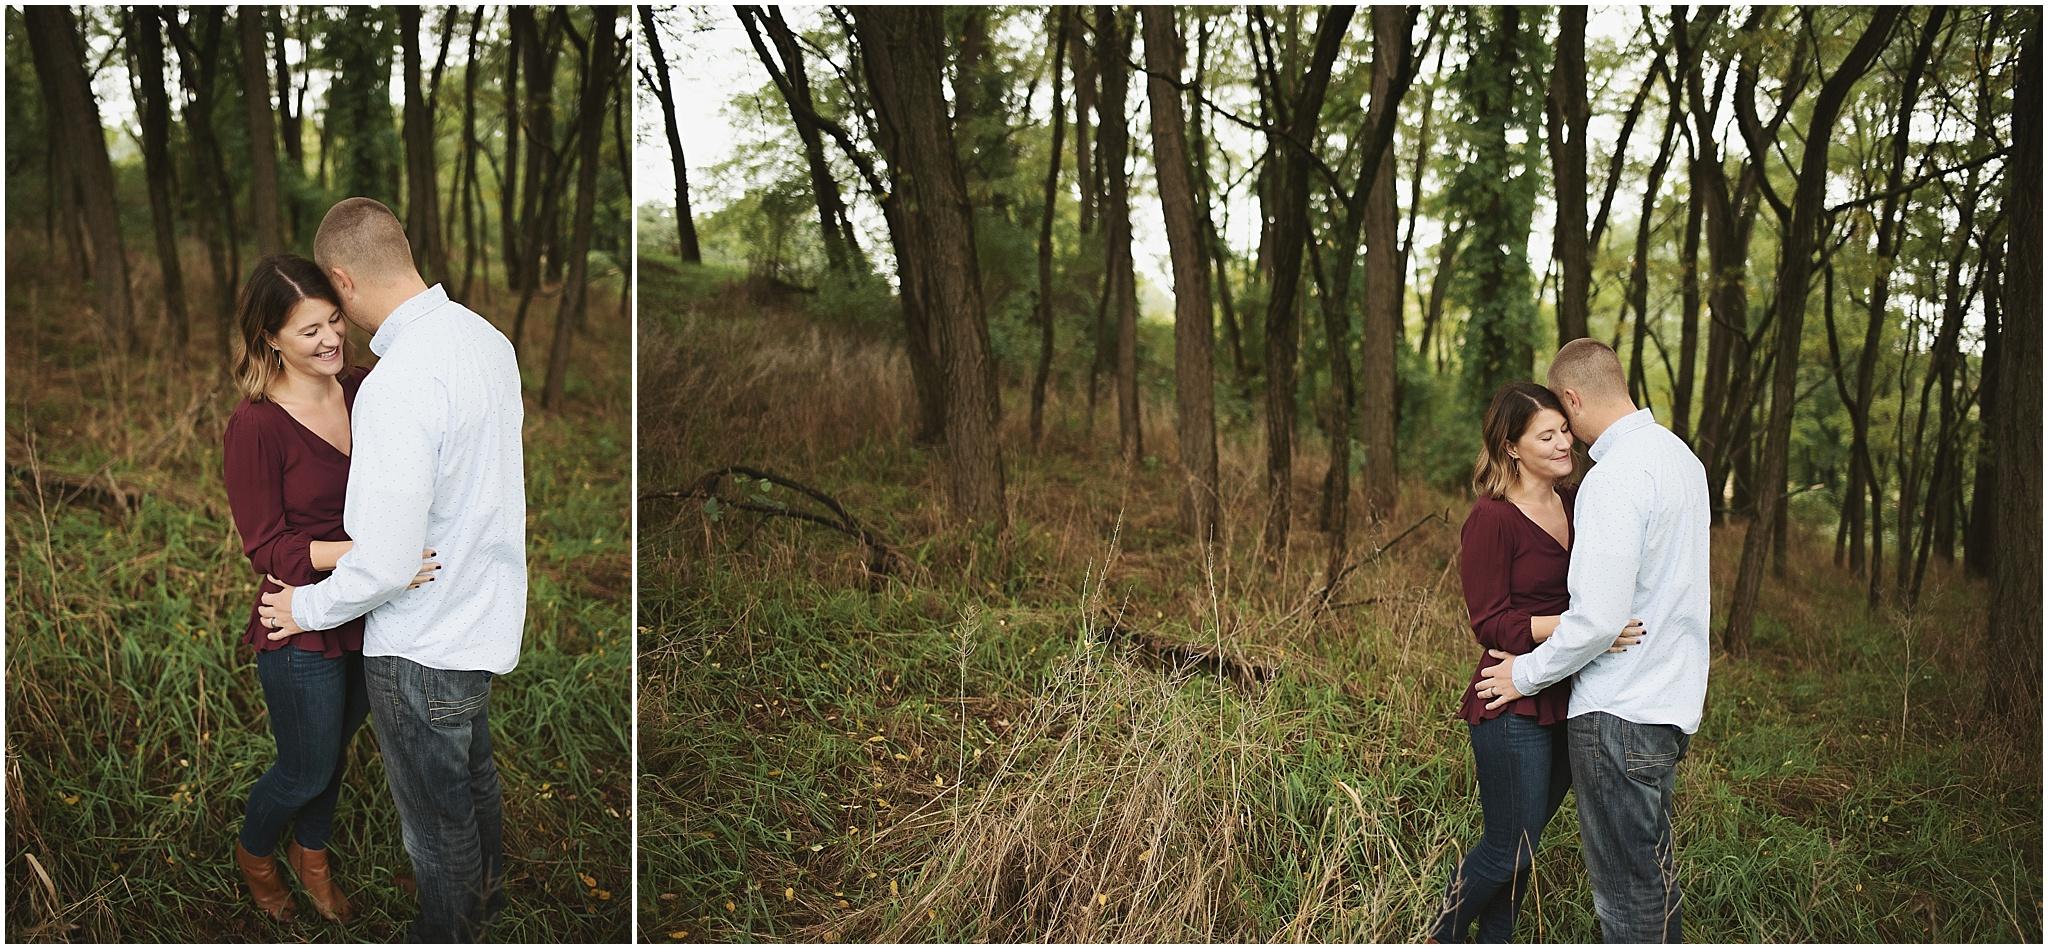 karra lynn photography - family photographer milford mi_0030.jpg